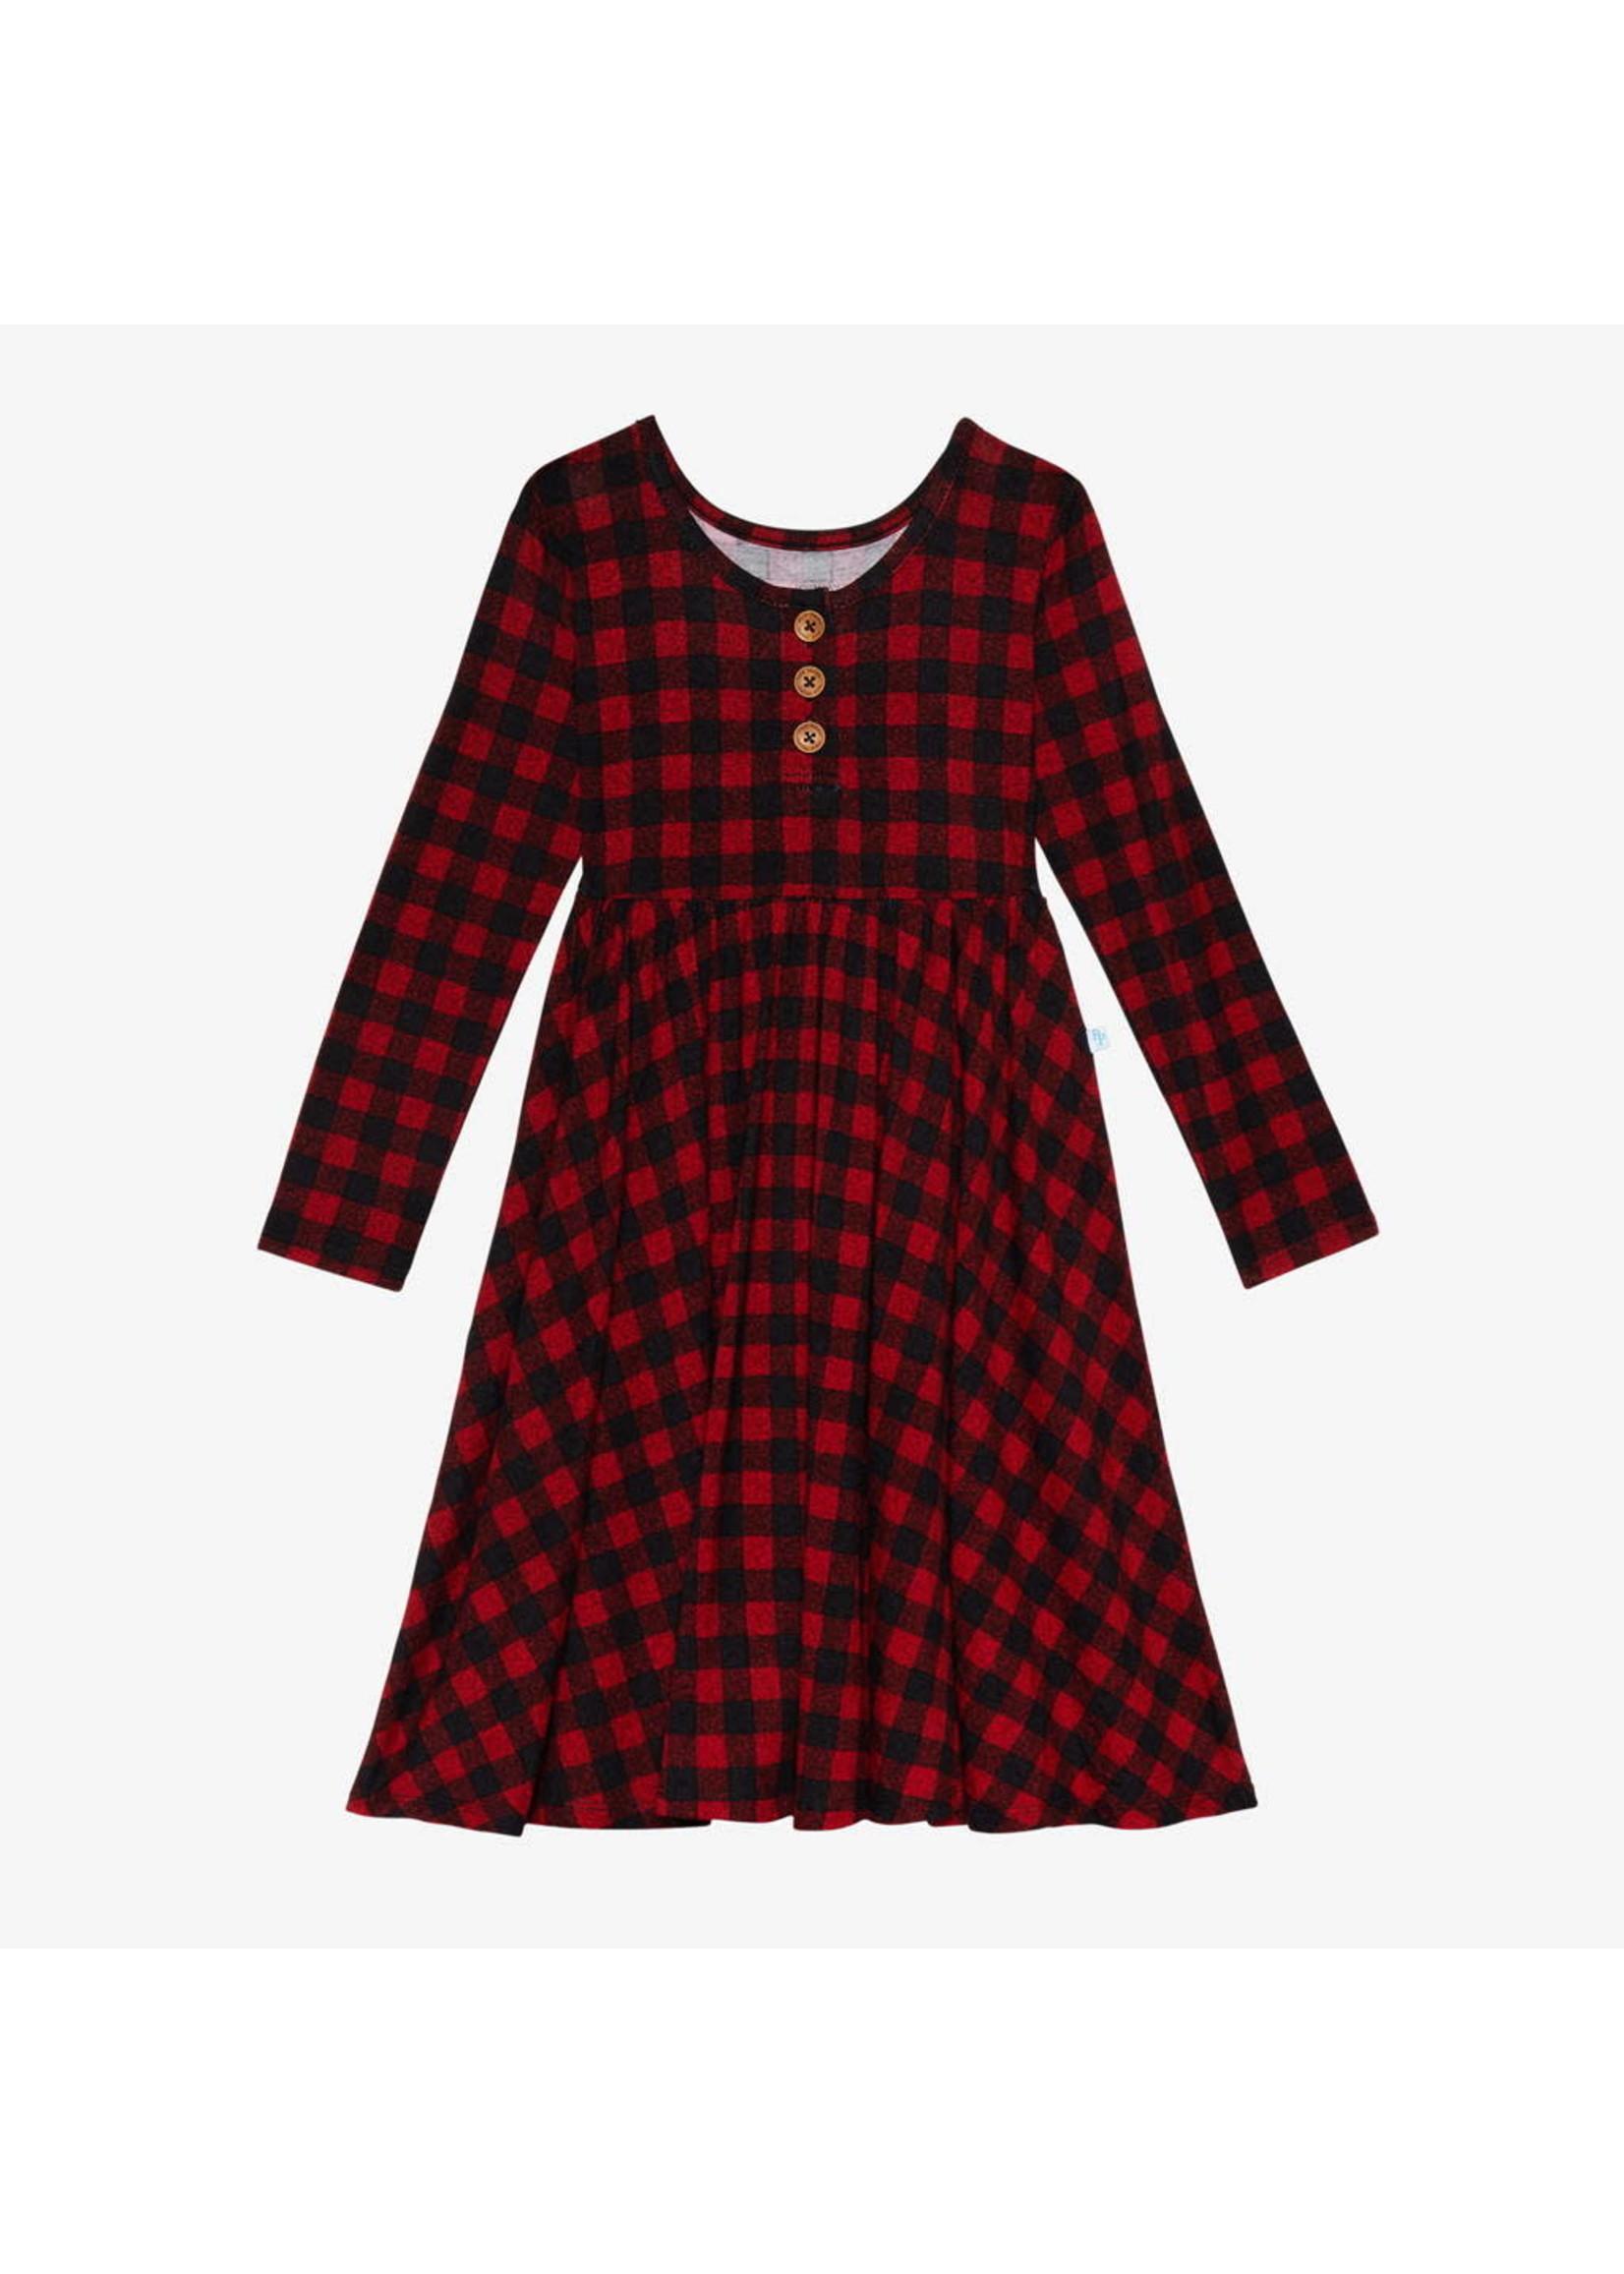 posh peanut Grayson Long Sleeve Twirl Dress 5T